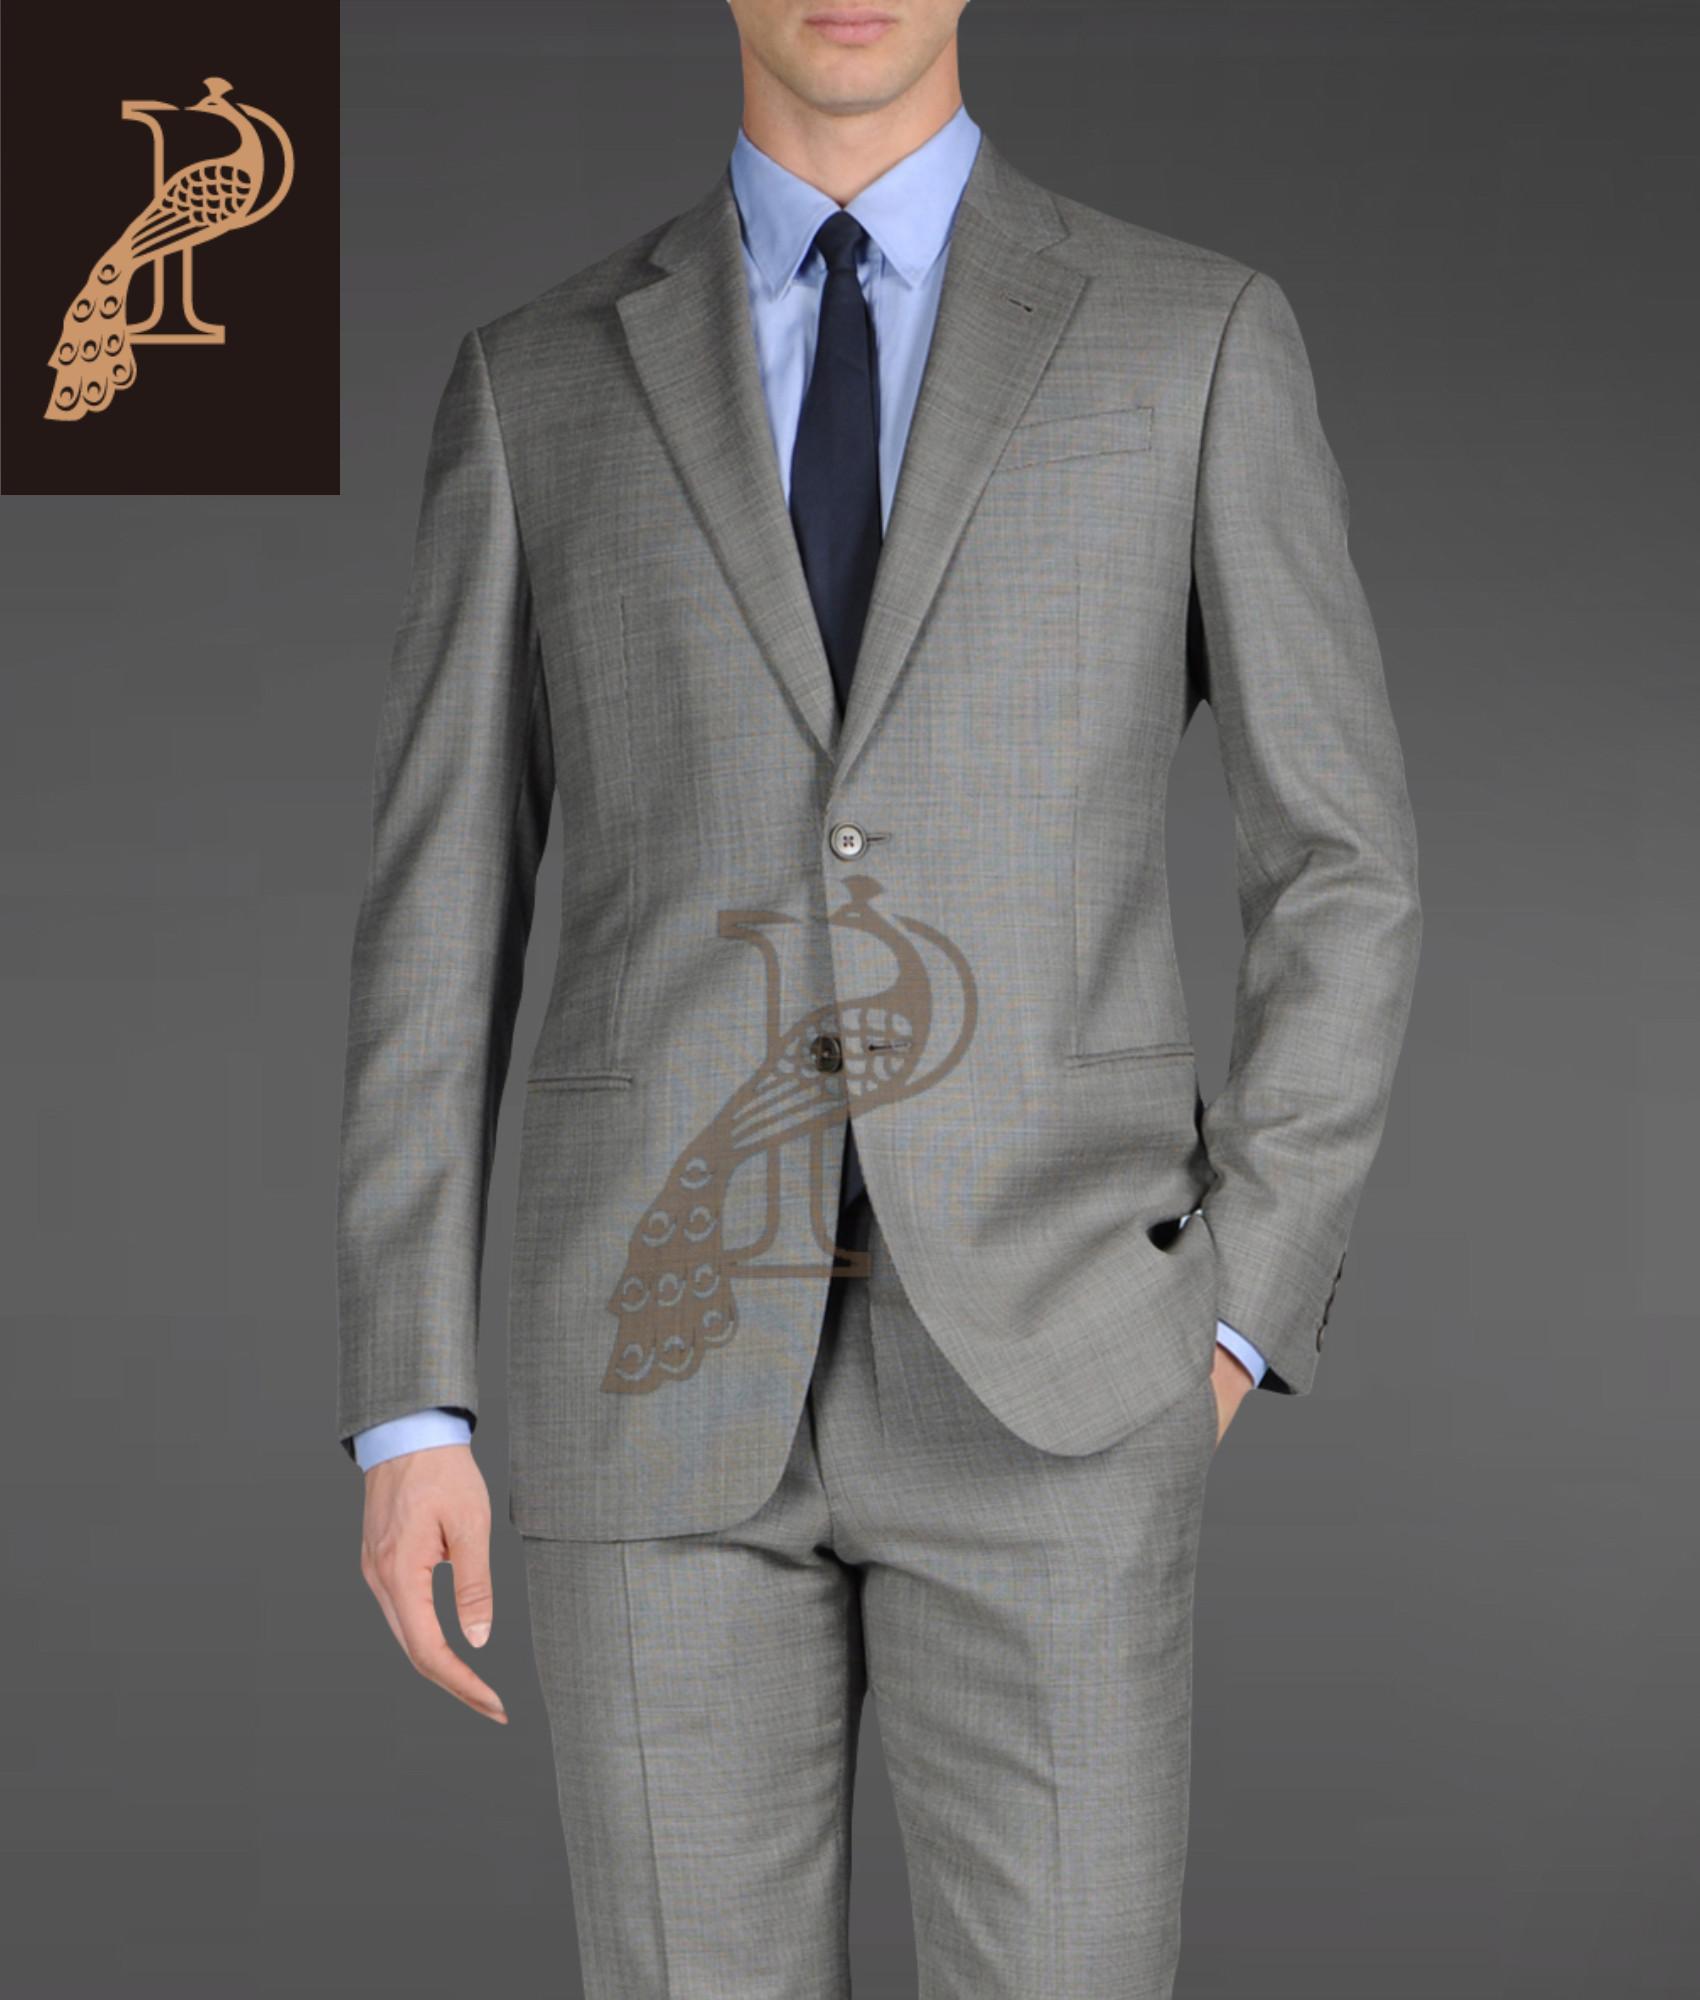 armani西装羊毛collezioni男装/ 欧美风格代购阿玛尼49124629rc